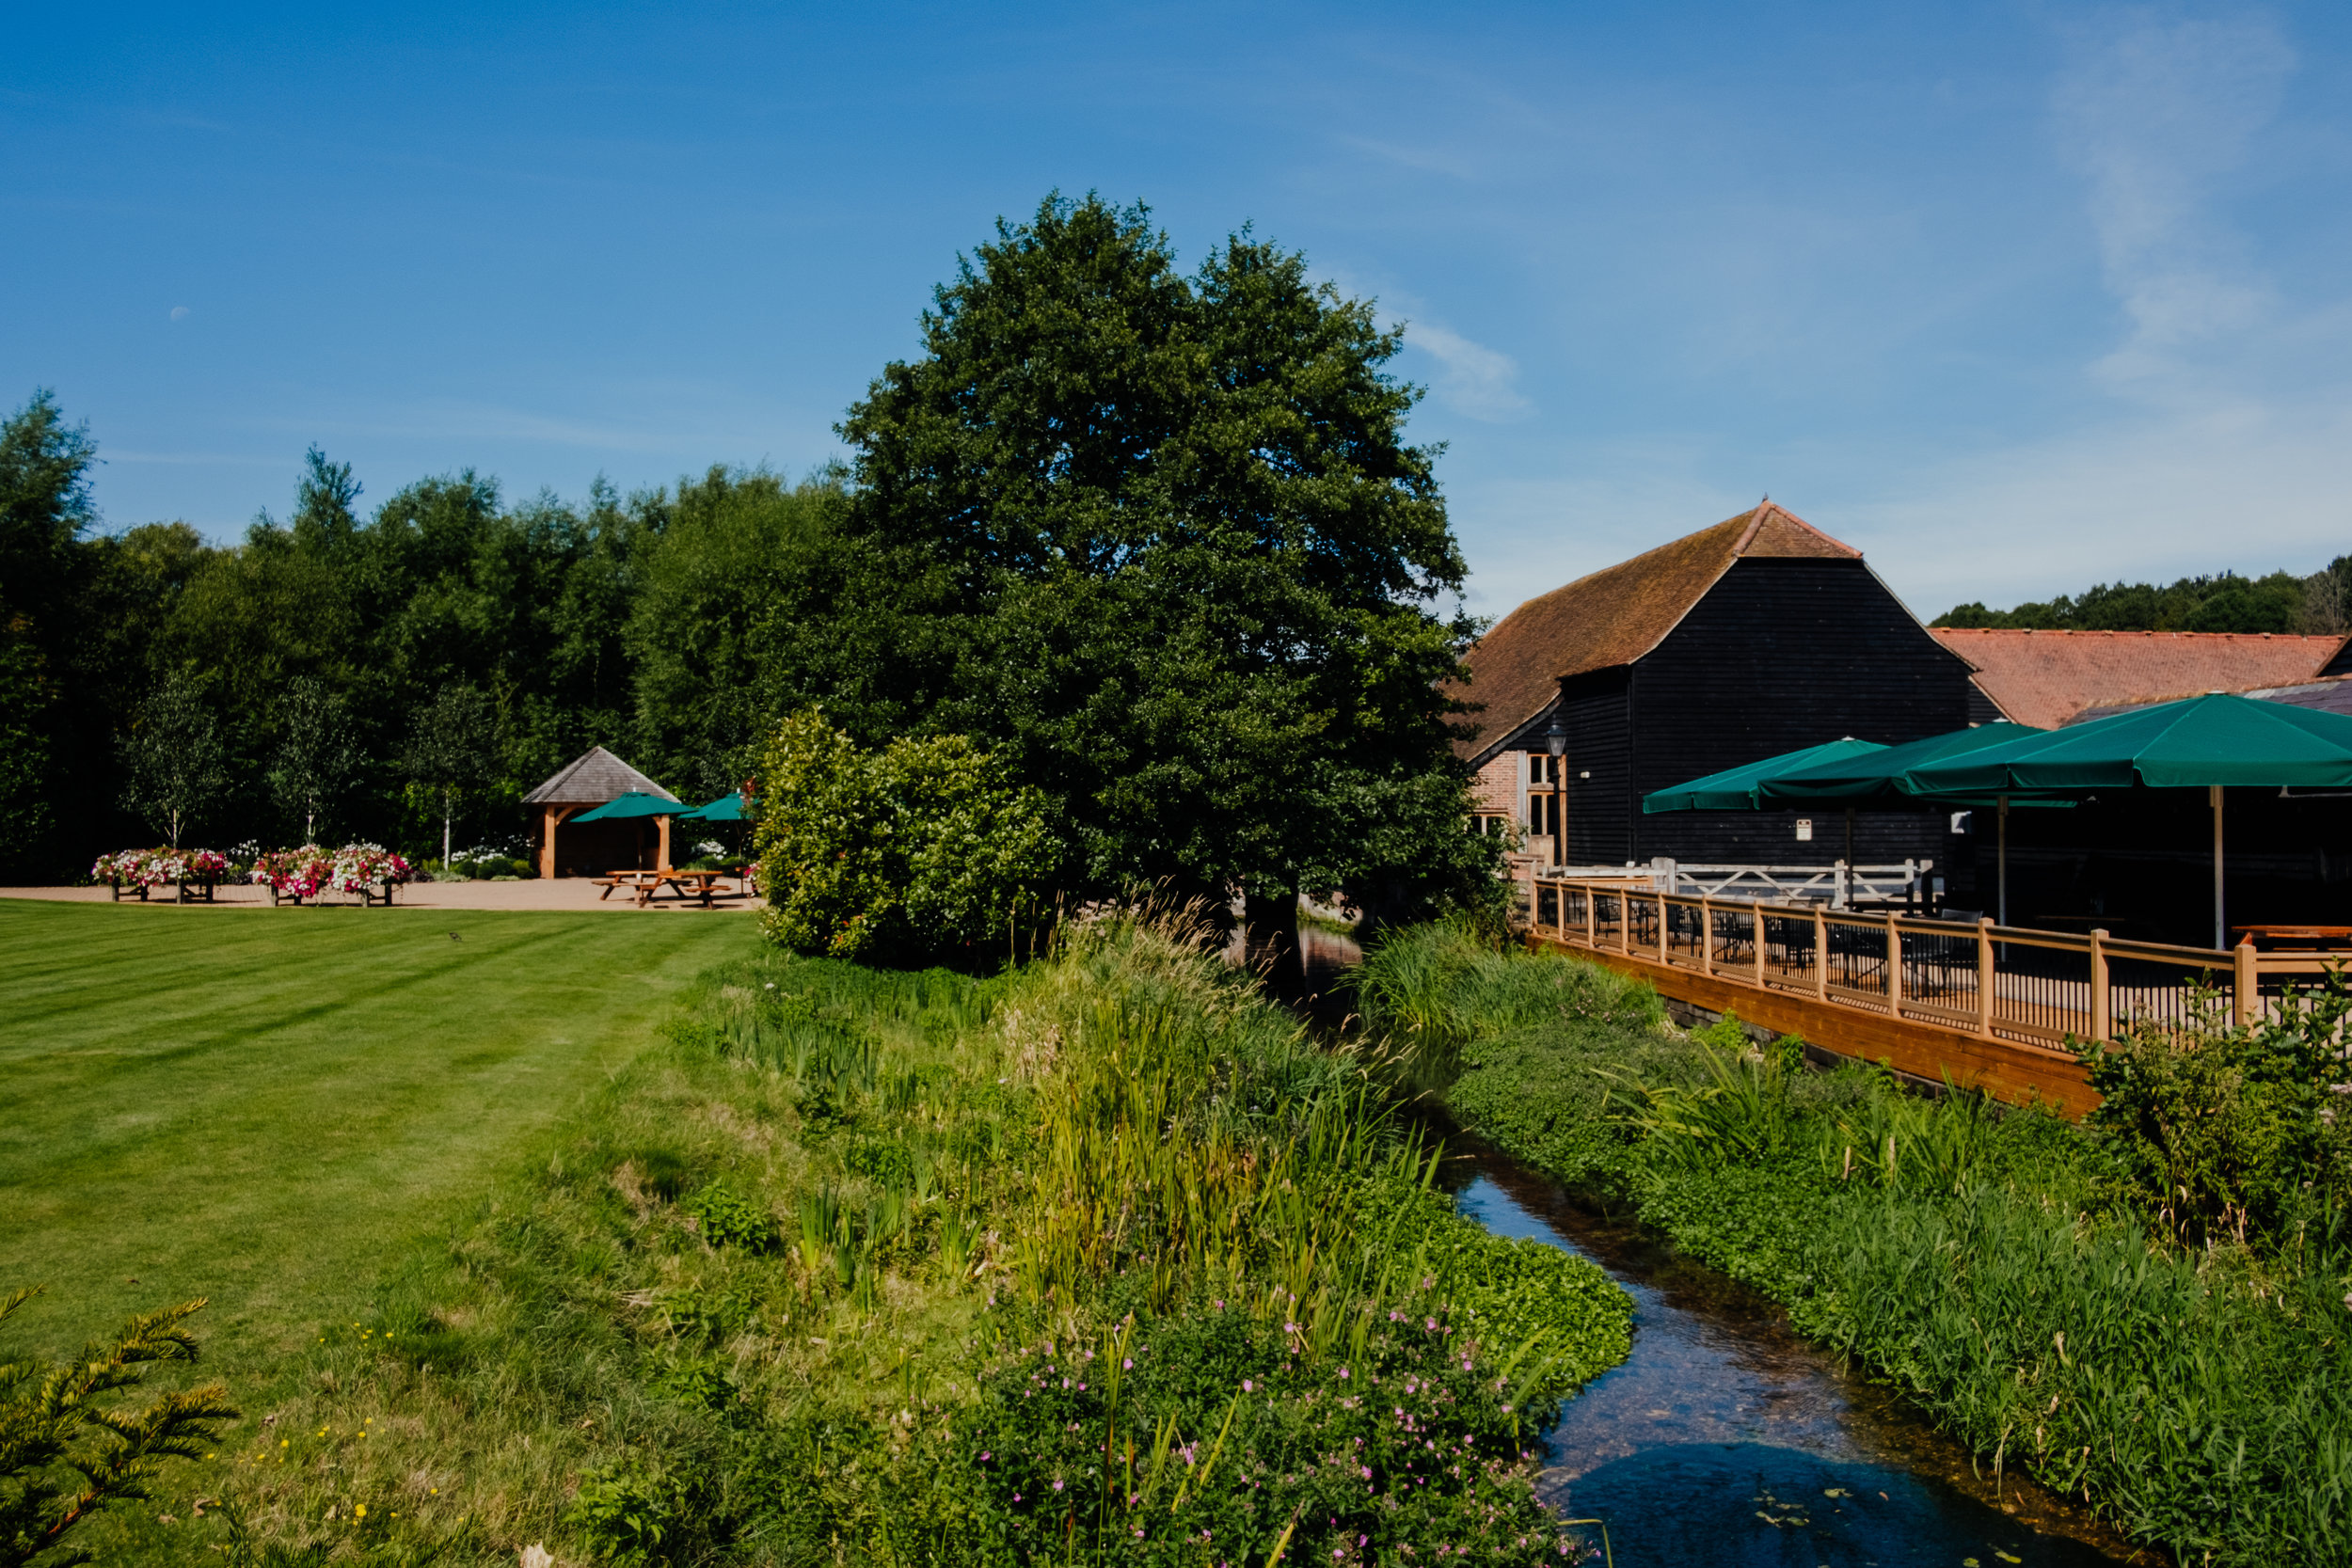 Tewin Bury Farm summer wedding